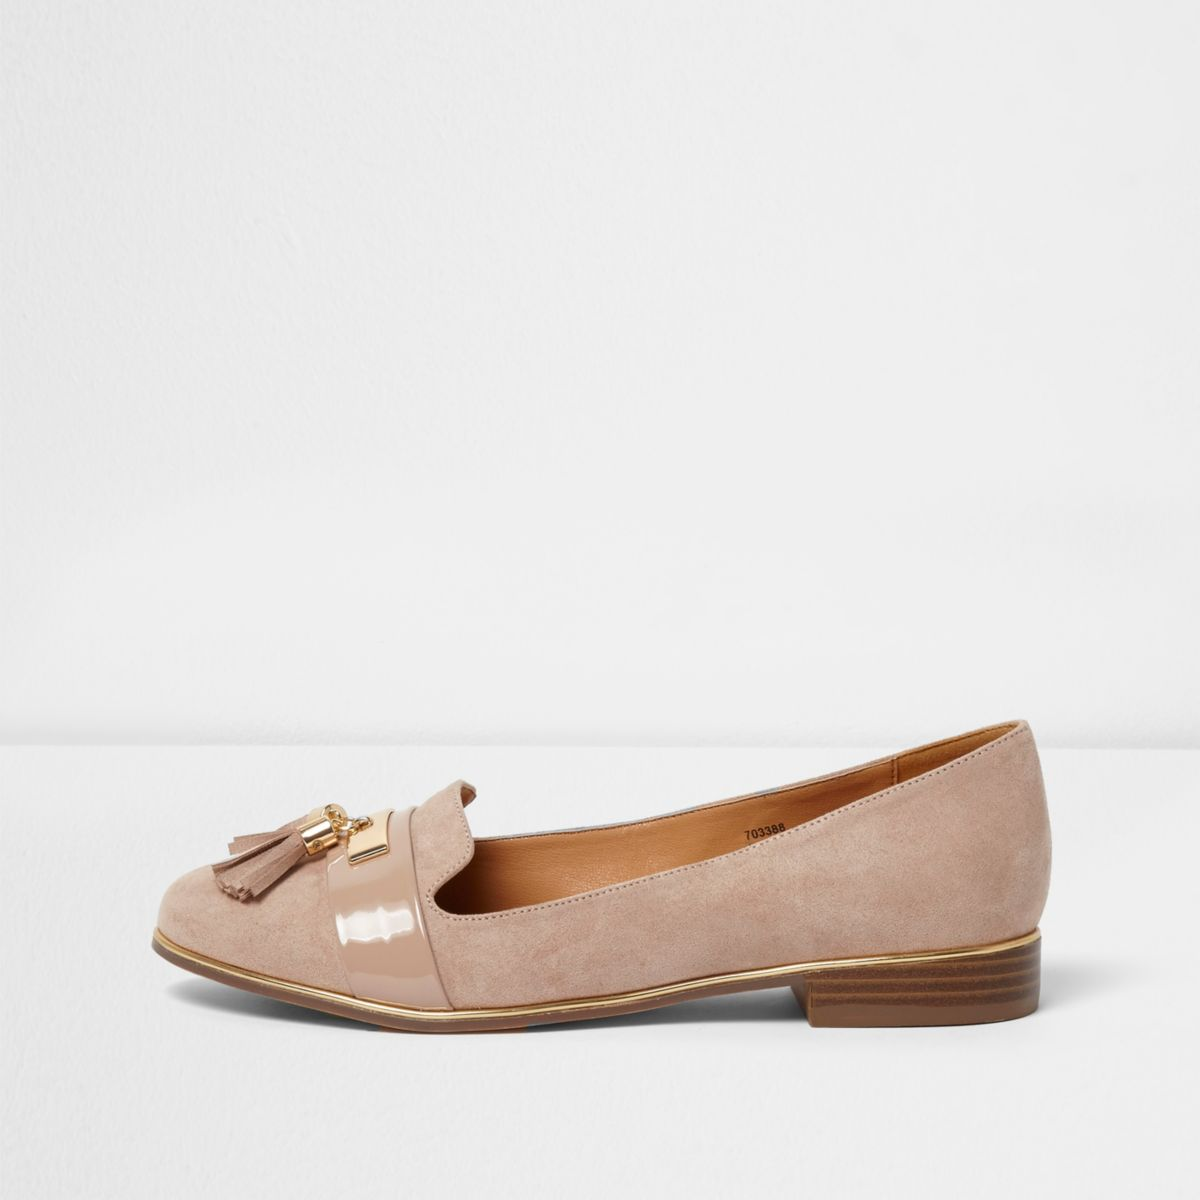 Light pink tassel loafers